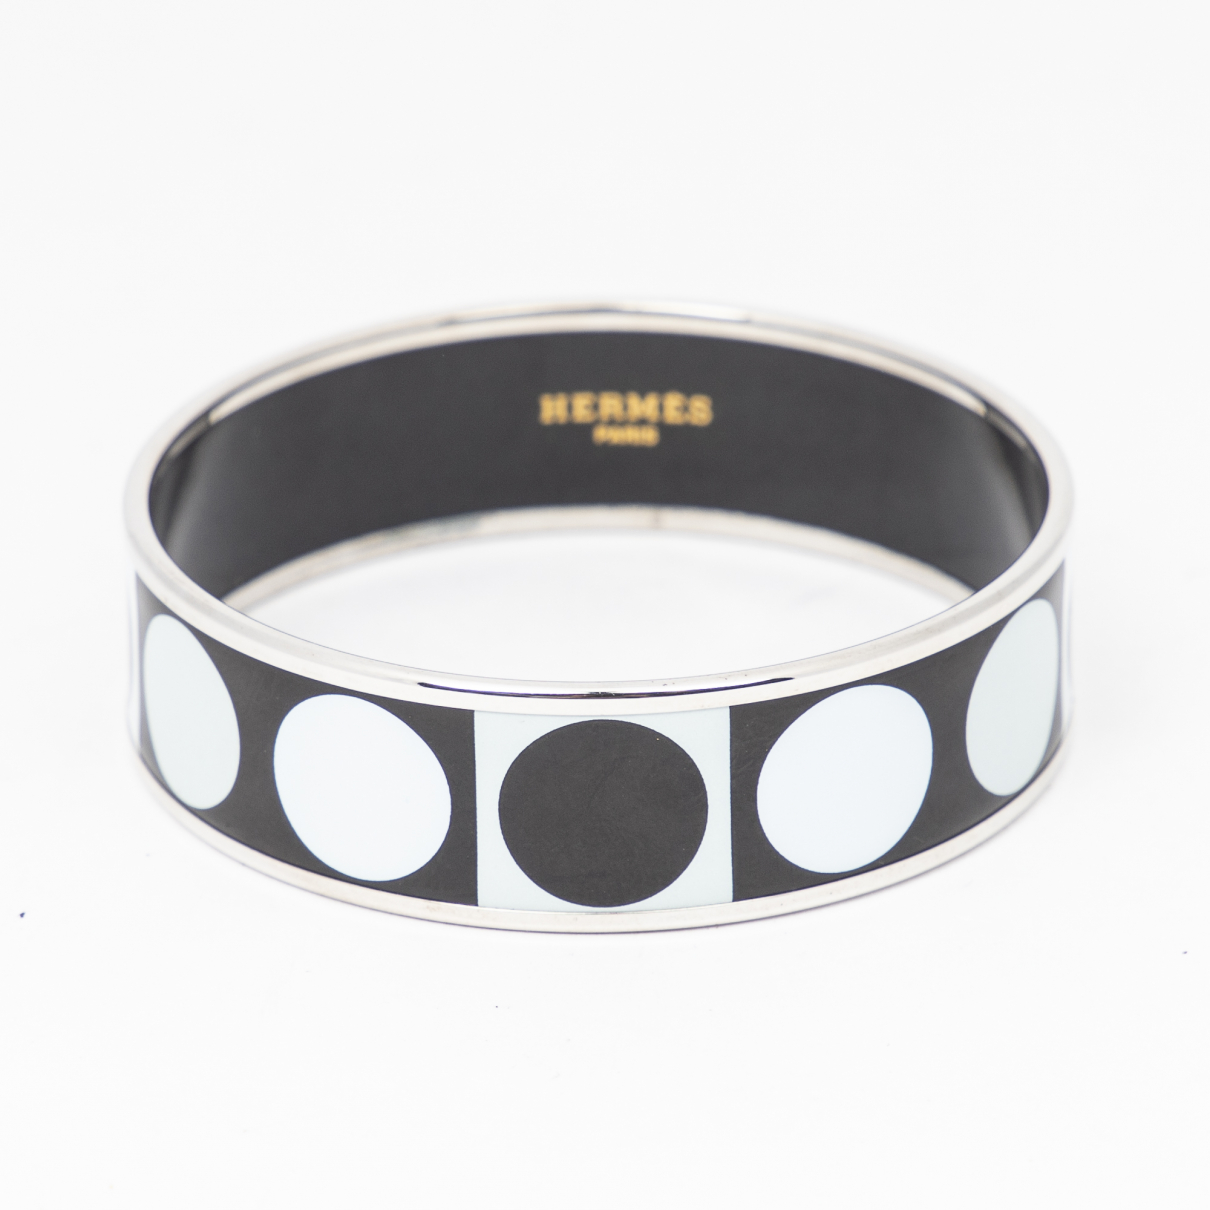 Hermes - Bracelet   pour femme en metal - blanc